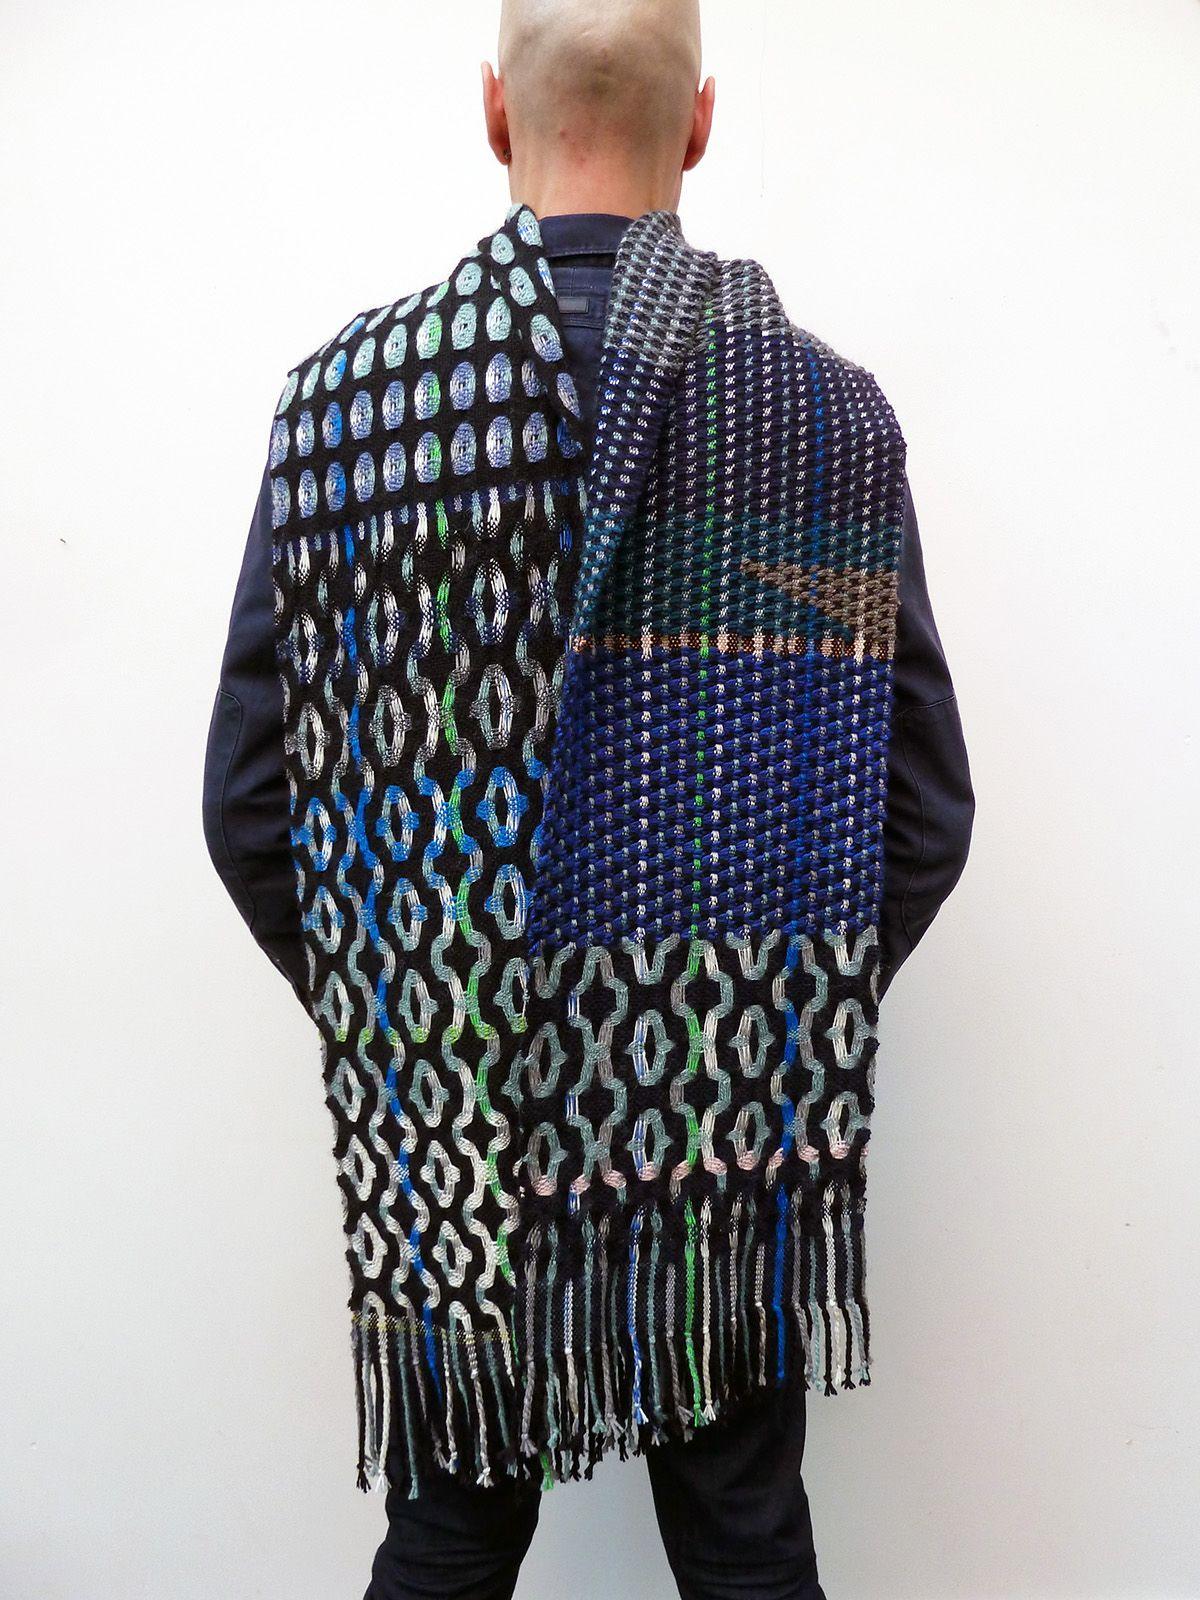 Ilse acke scarf mathilde my work ilse acke pinterest weven mode en inspiratie - Mathilde ontwerp ...